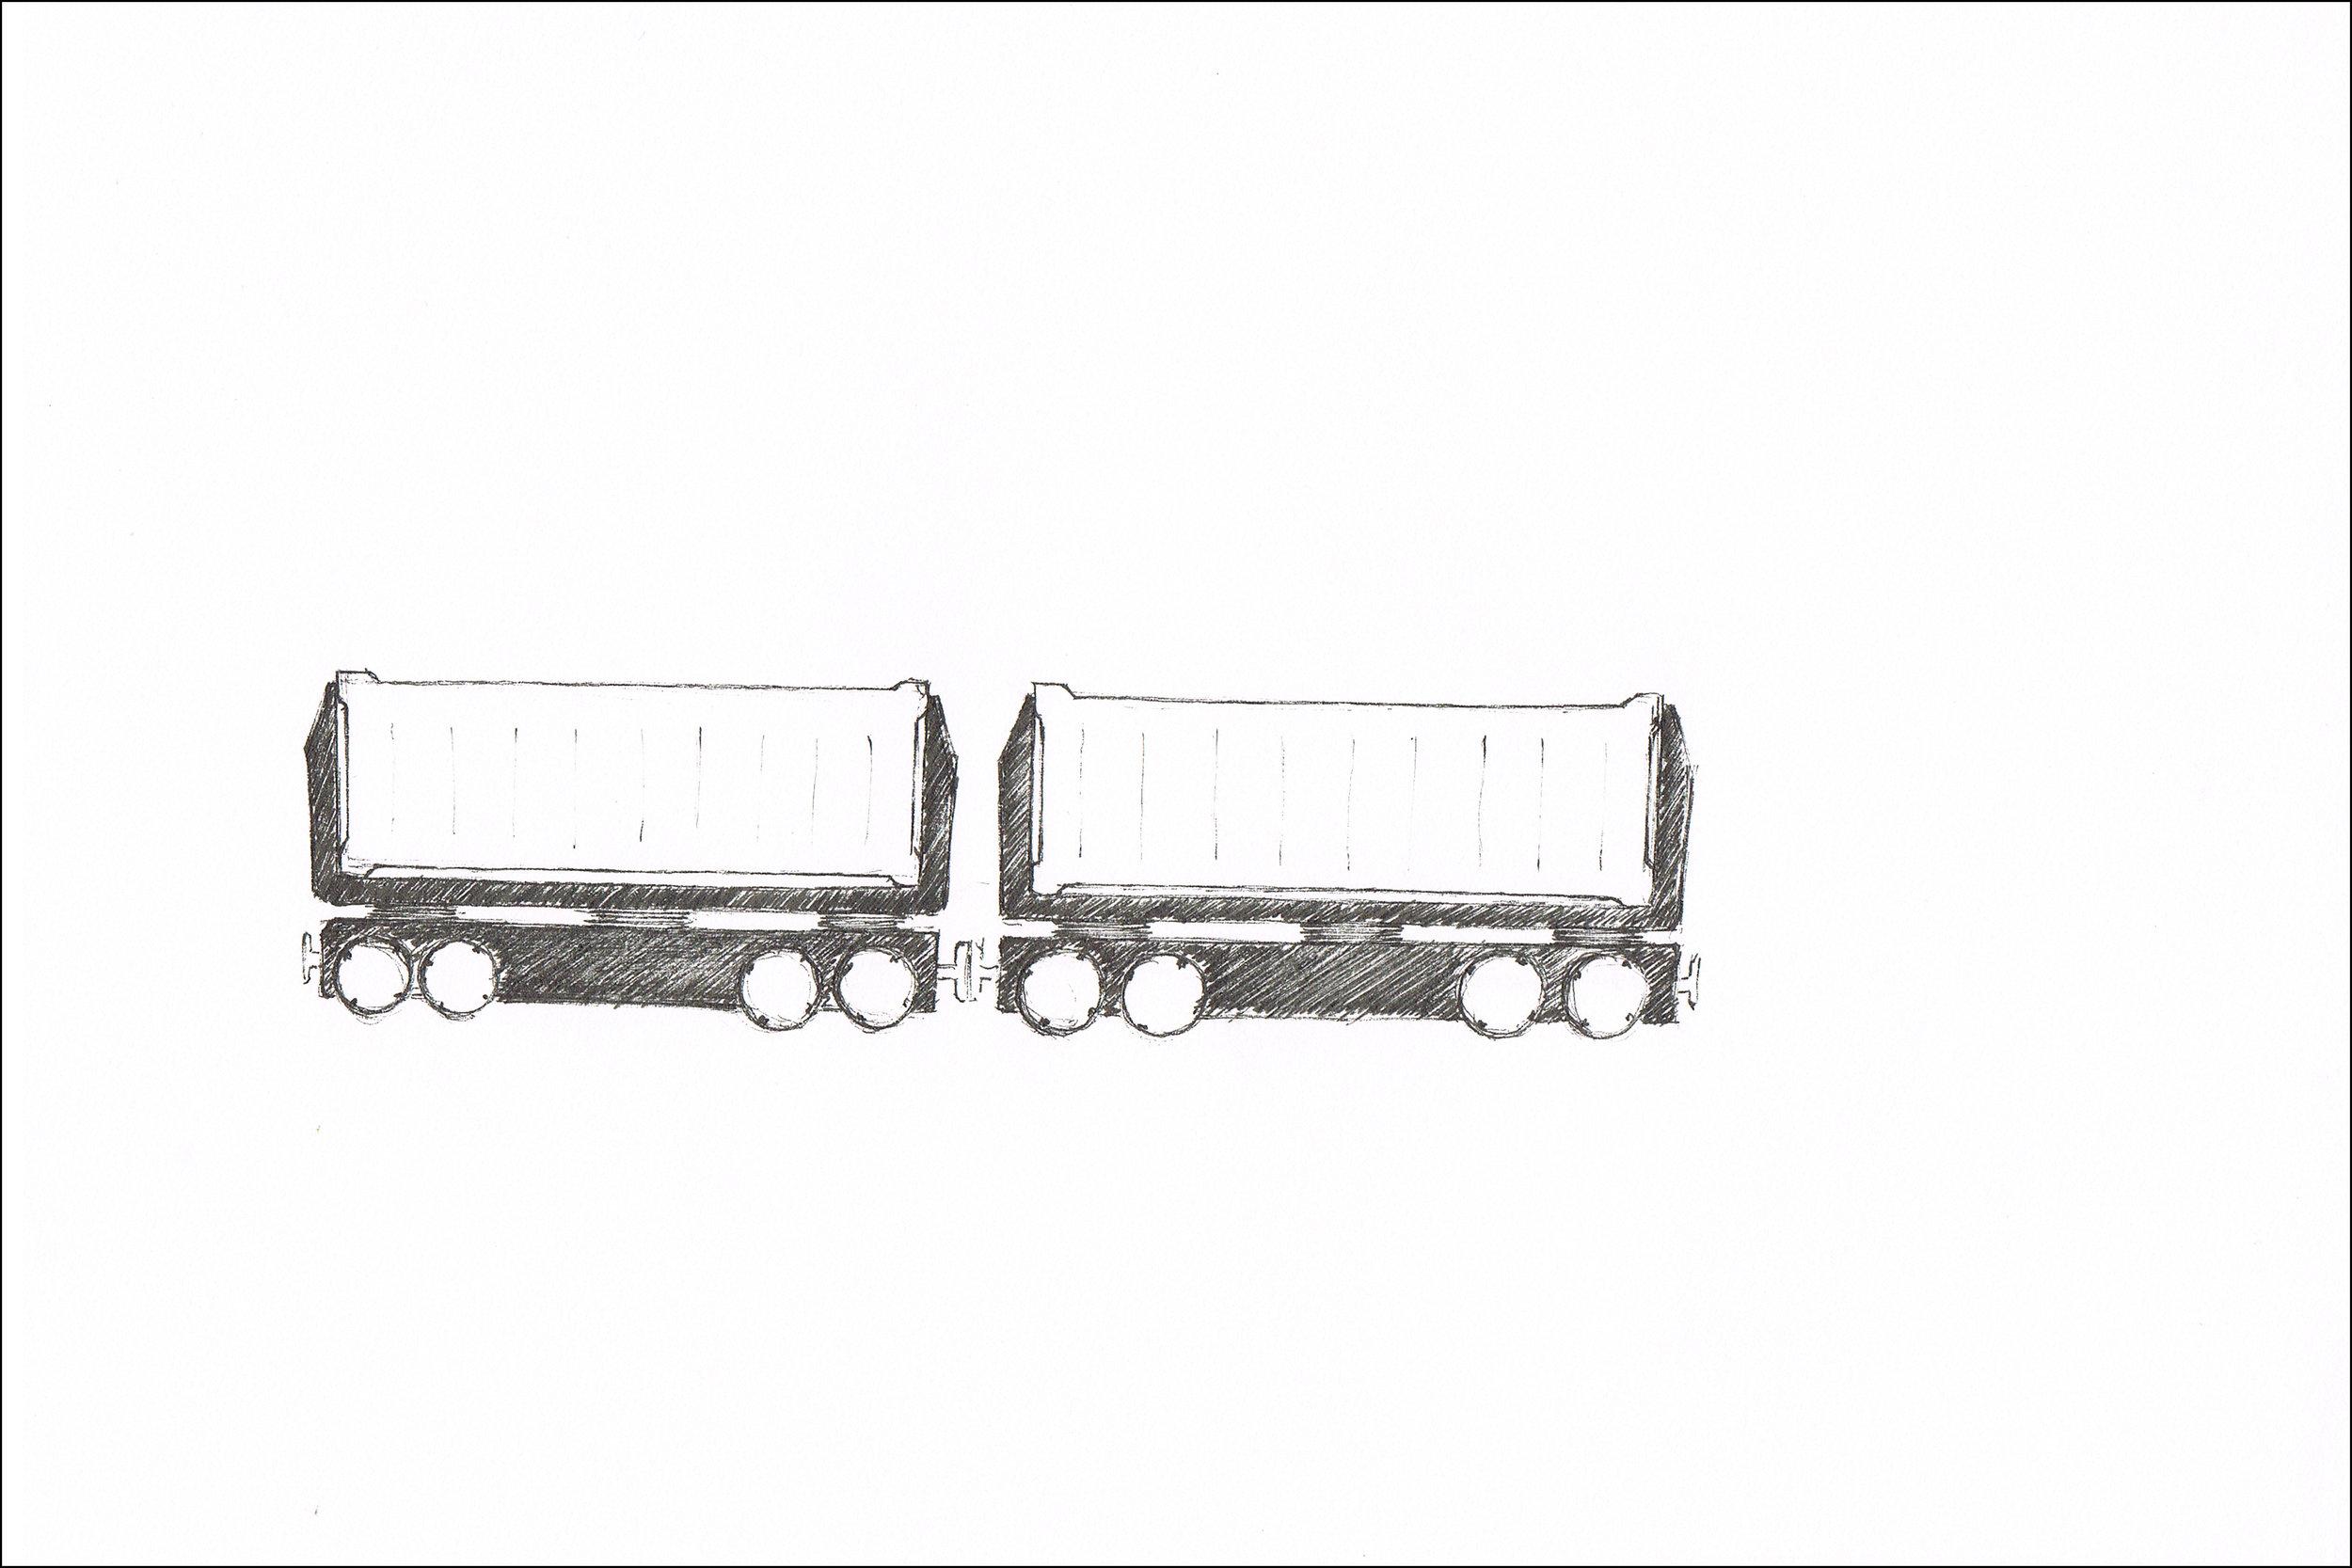 Multiple designs for a Cargo train